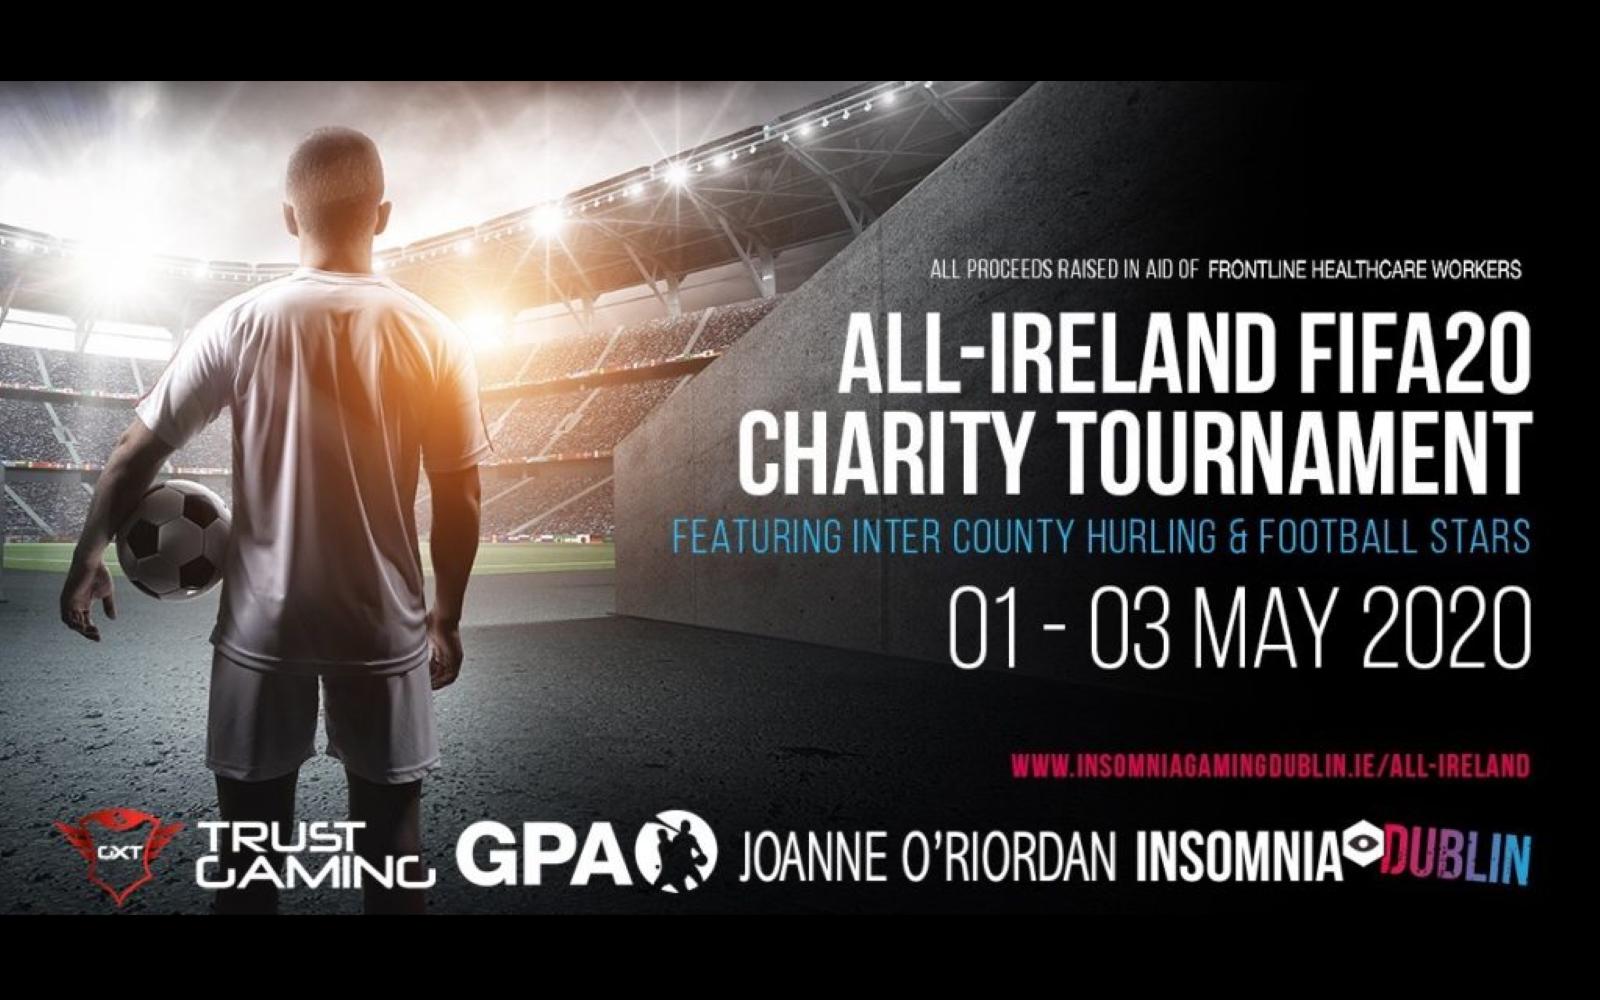 All-Ireland FIFA 20 Charity Tournament Starts May 1st